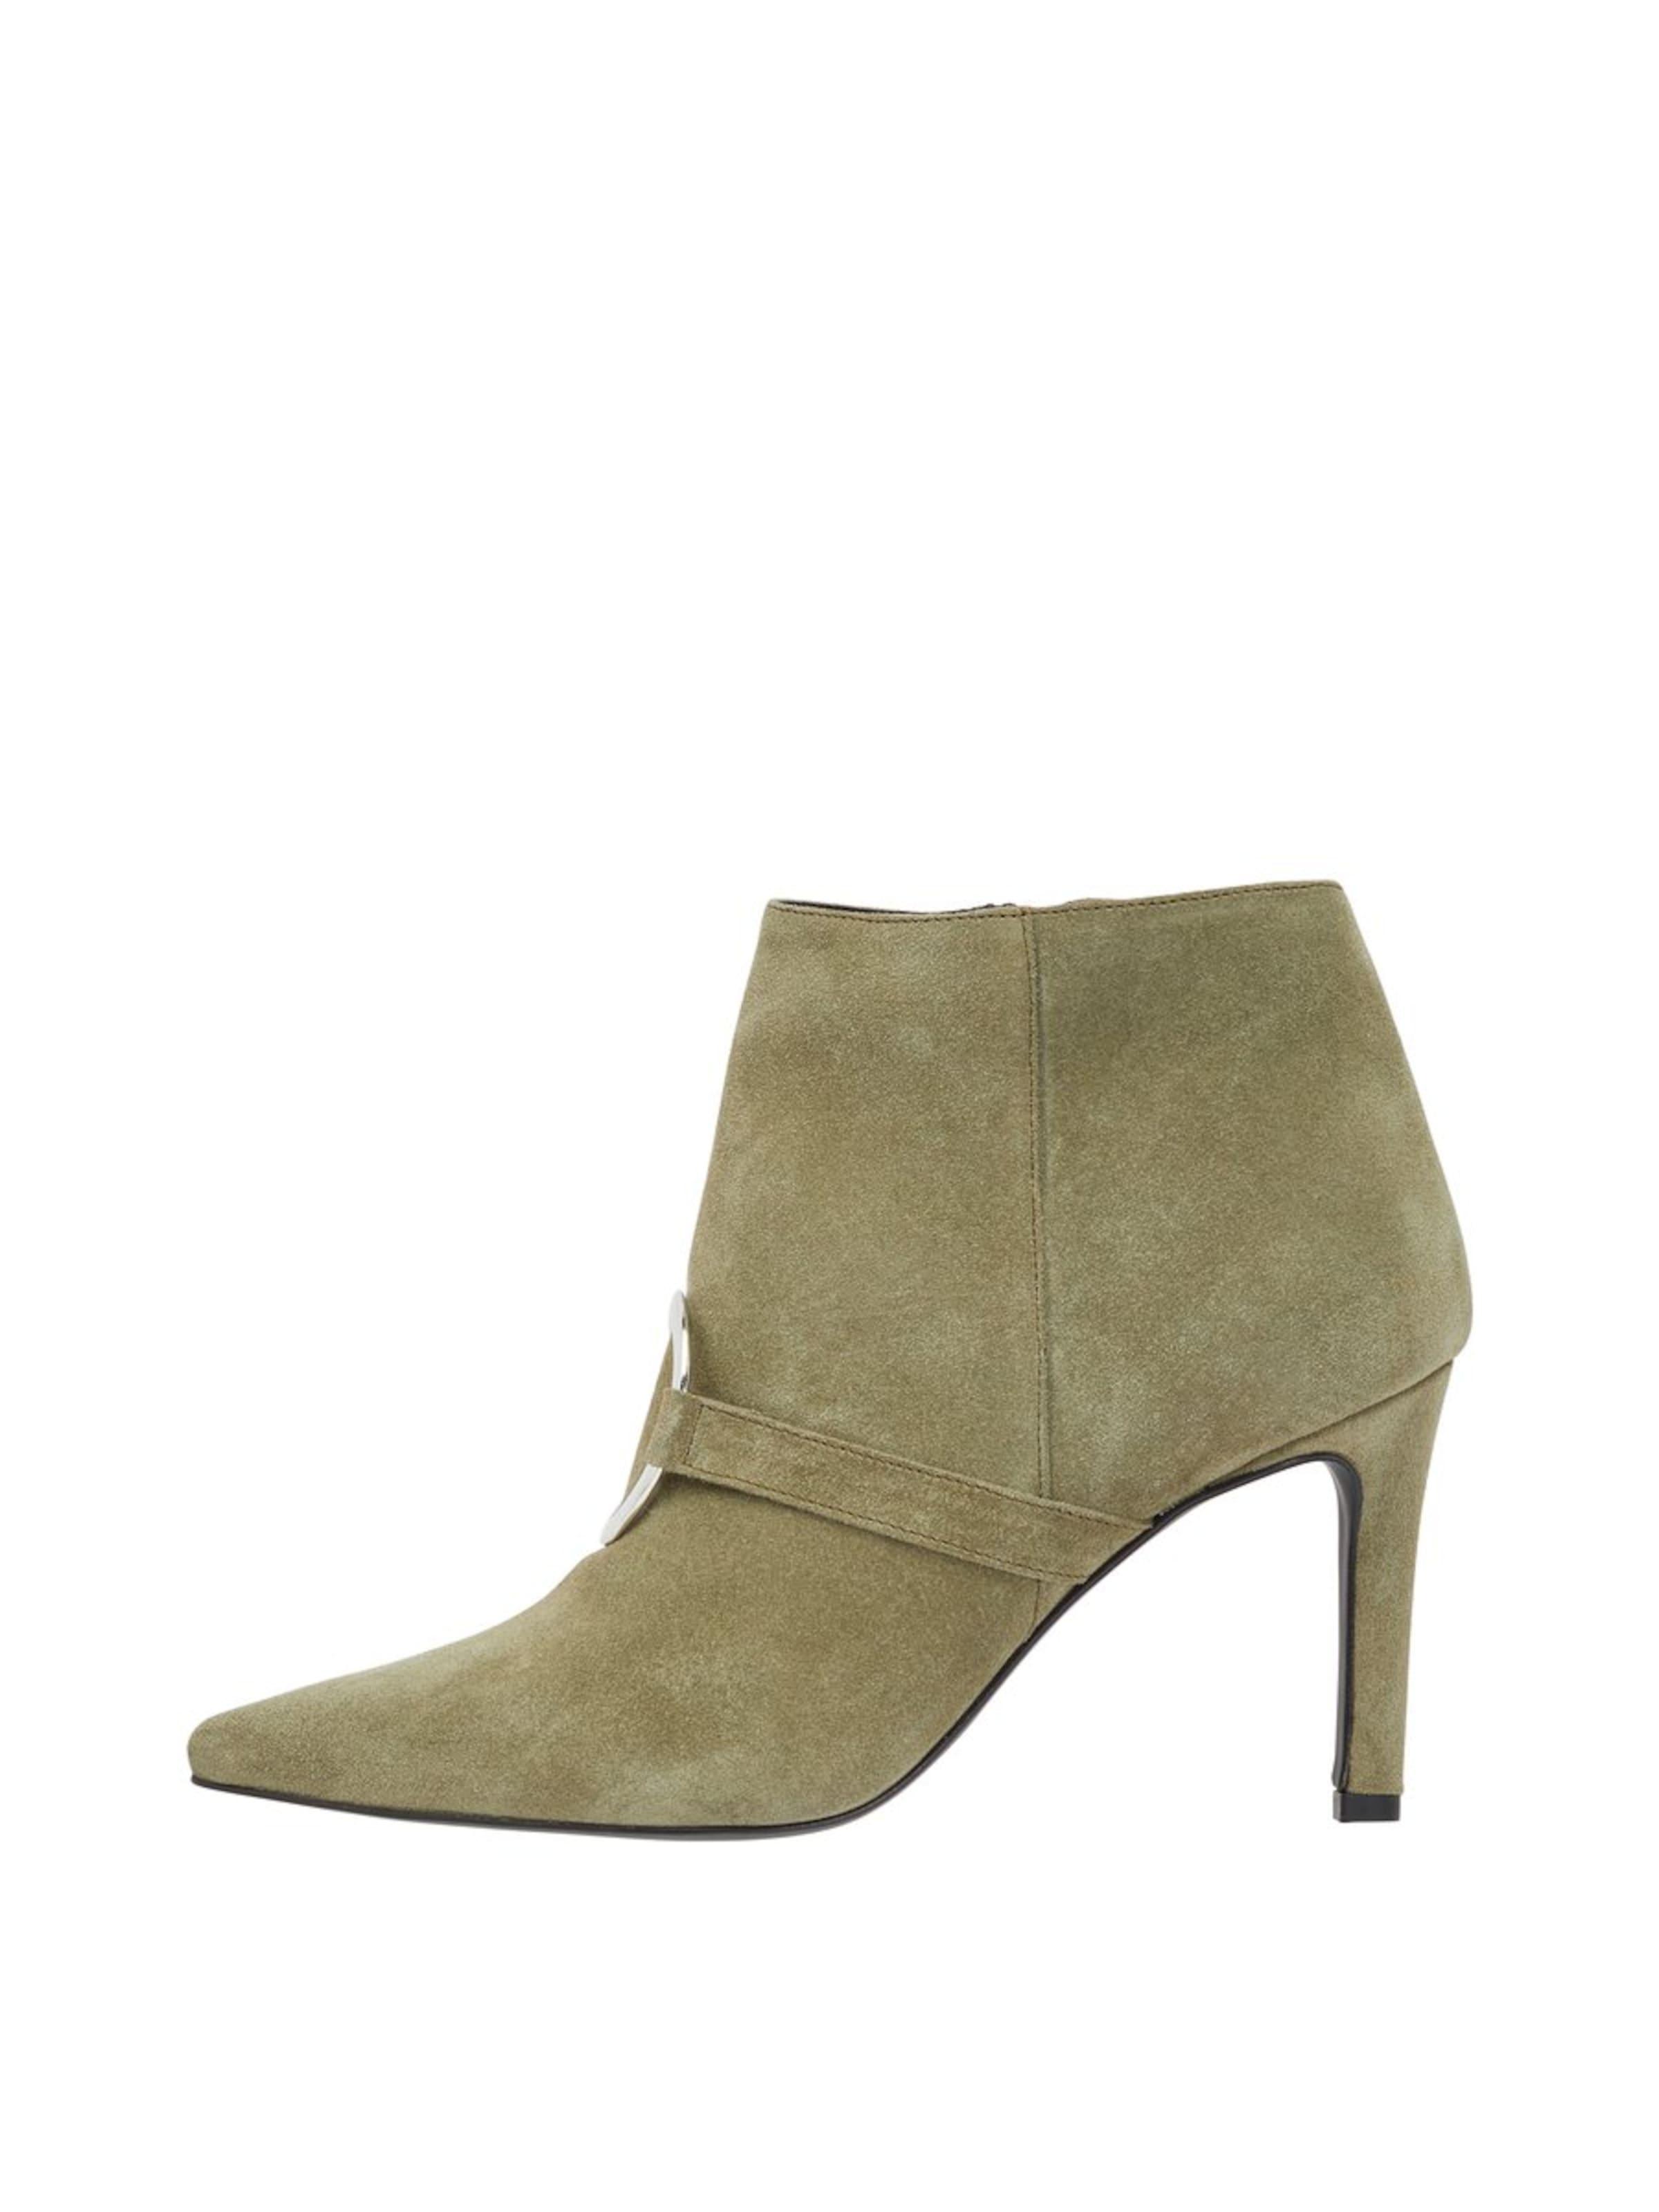 Bianco In Khaki Boots 'alvira' Ankle 4A3RqL5jcS